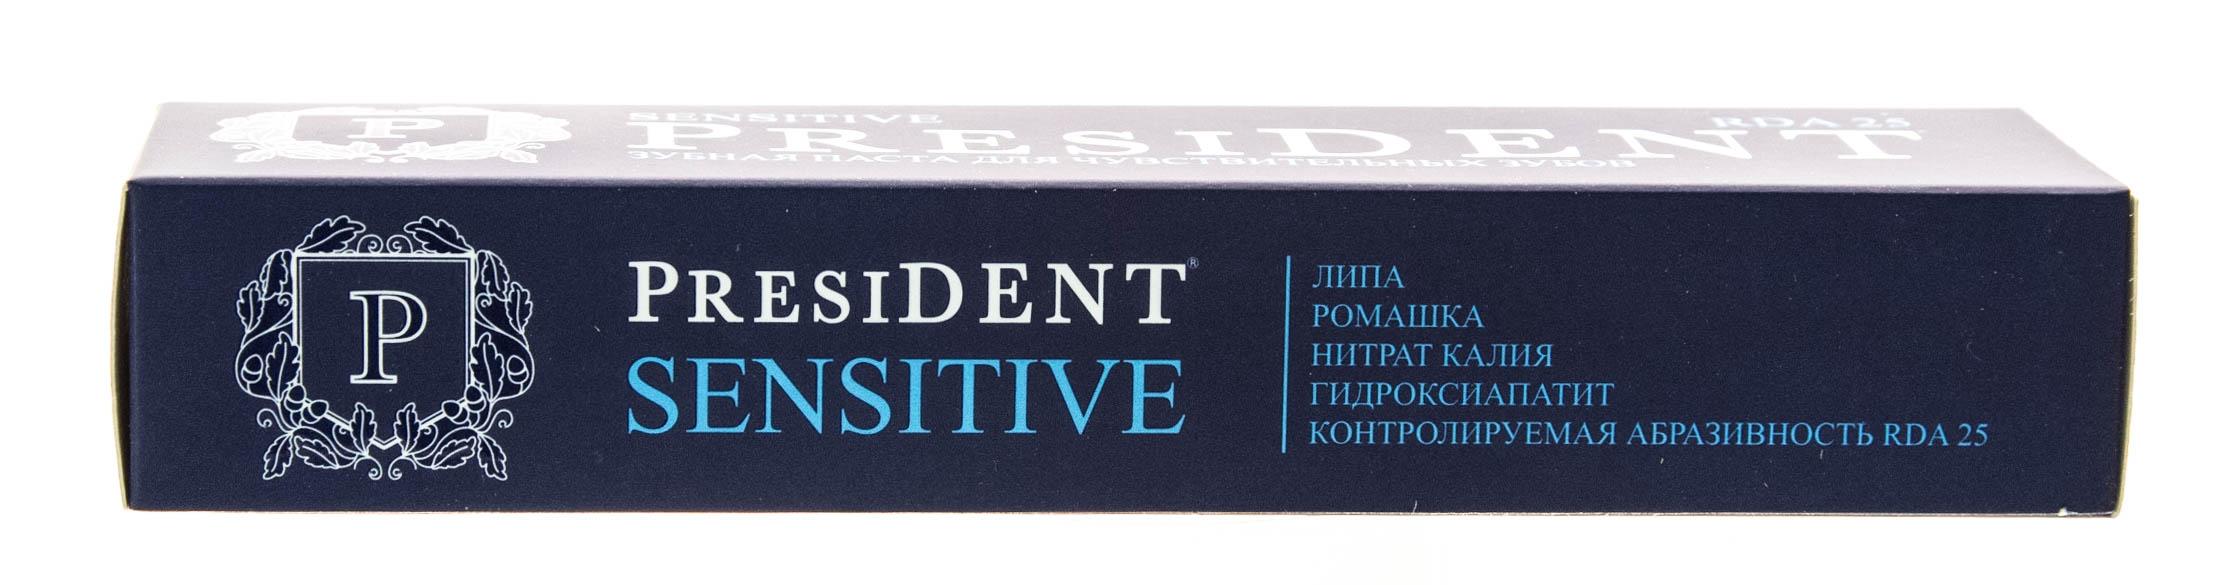 Купить President Сенситив паста зубная 100 мл (President, Sensitive), Италия